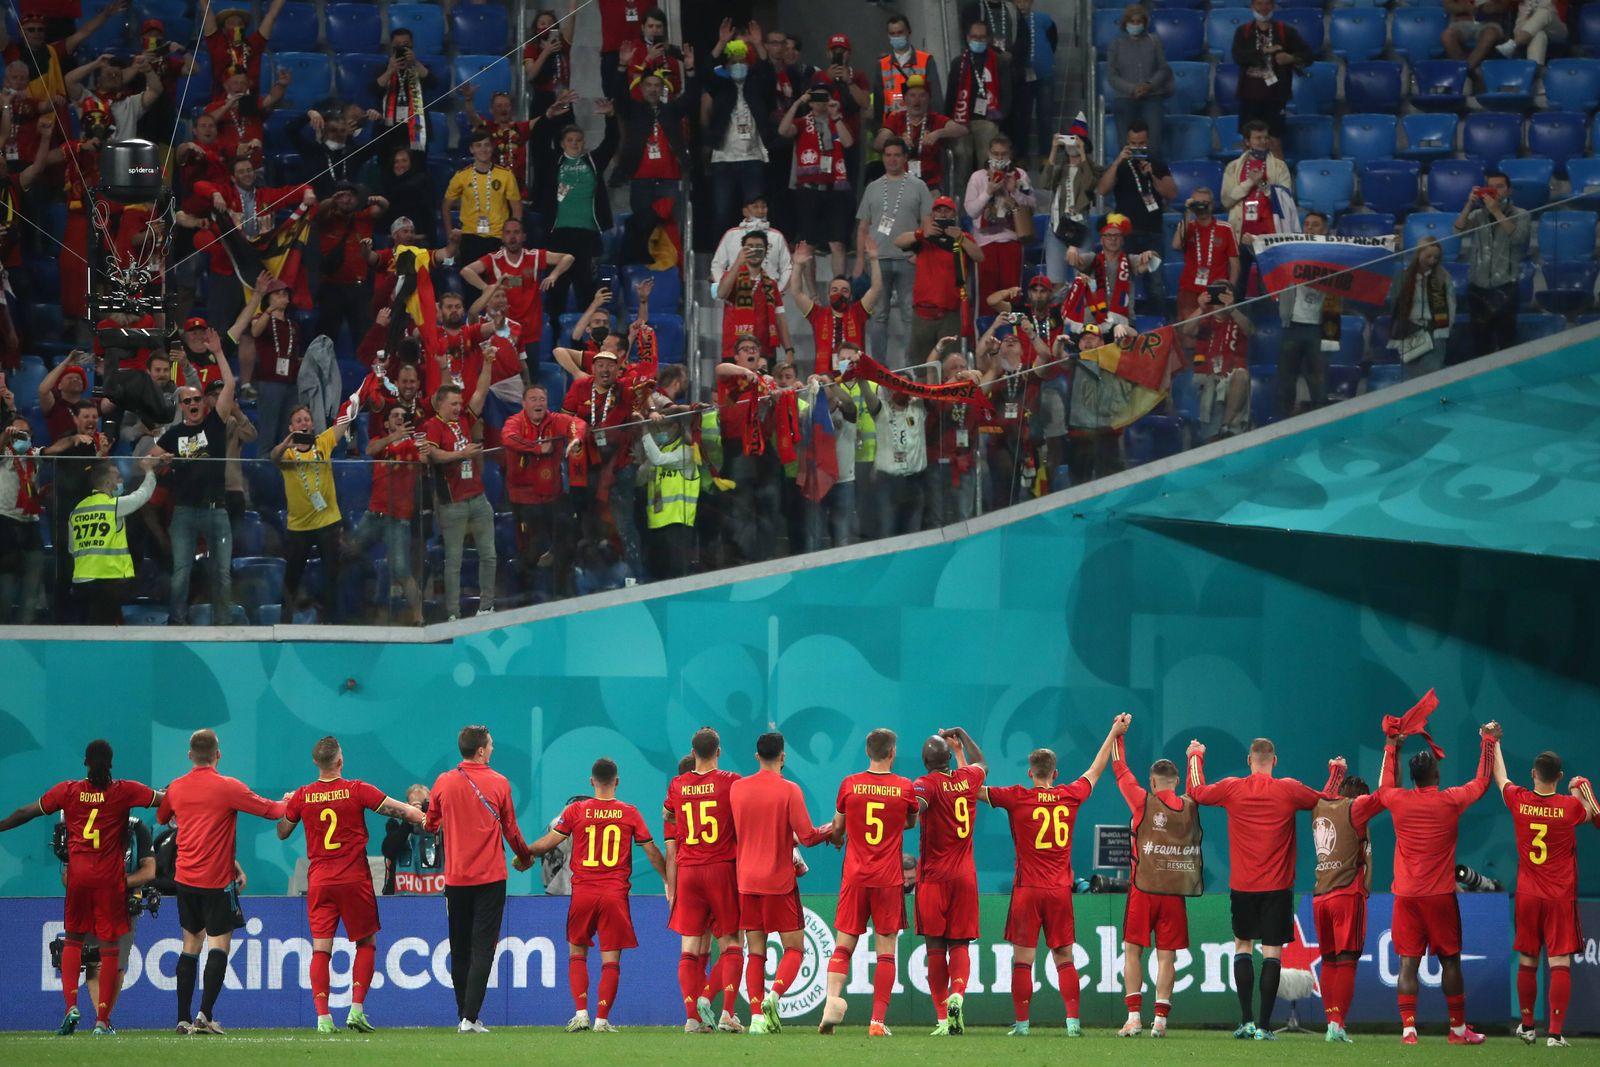 ST PETERSBURG, RUSSIA - JUNE 12, 2021: Belgium s players celebrate victory in the UEFA EURO, EM, Europameisterschaft,Fus